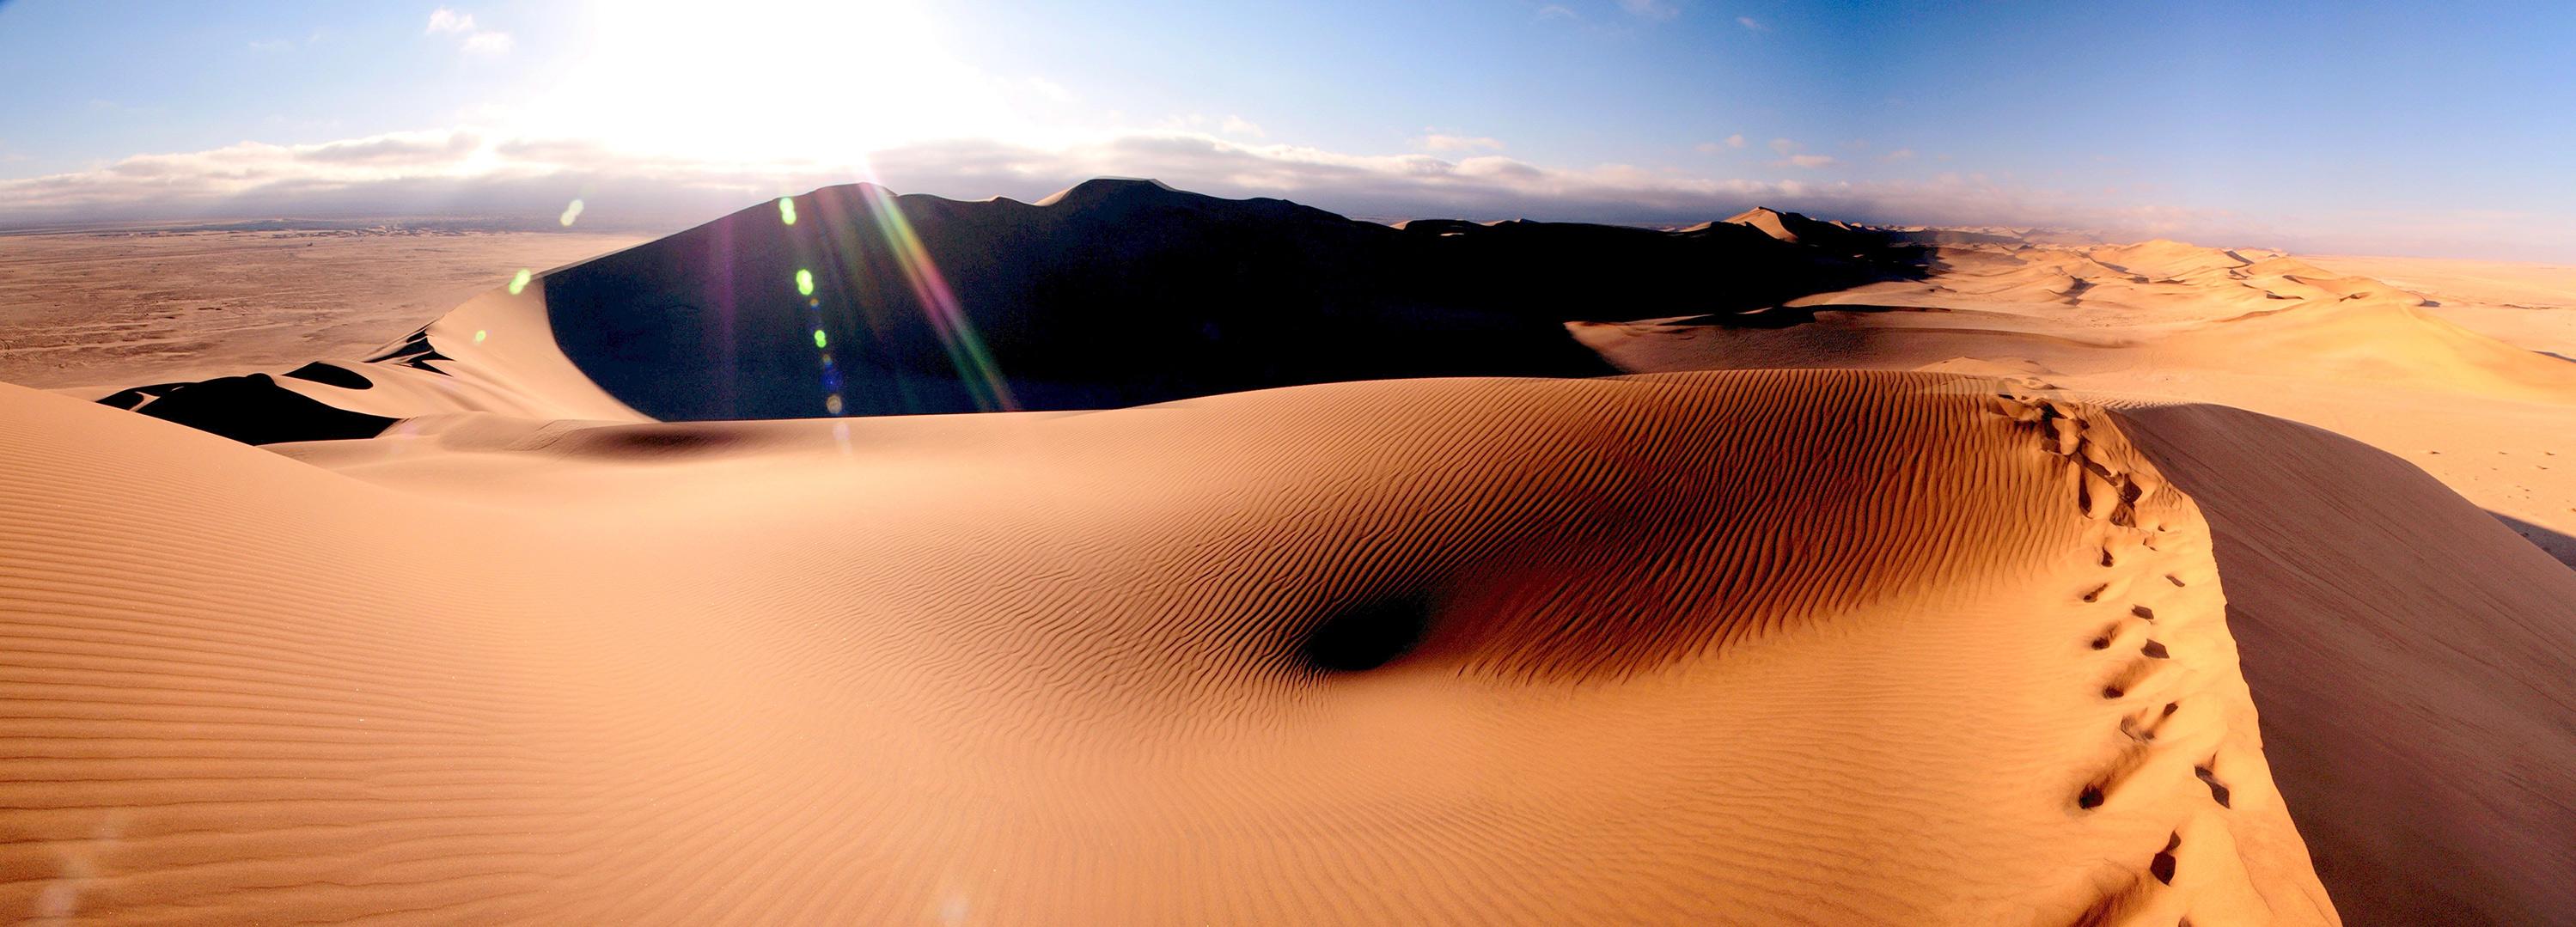 desert-dunes-hot-259474